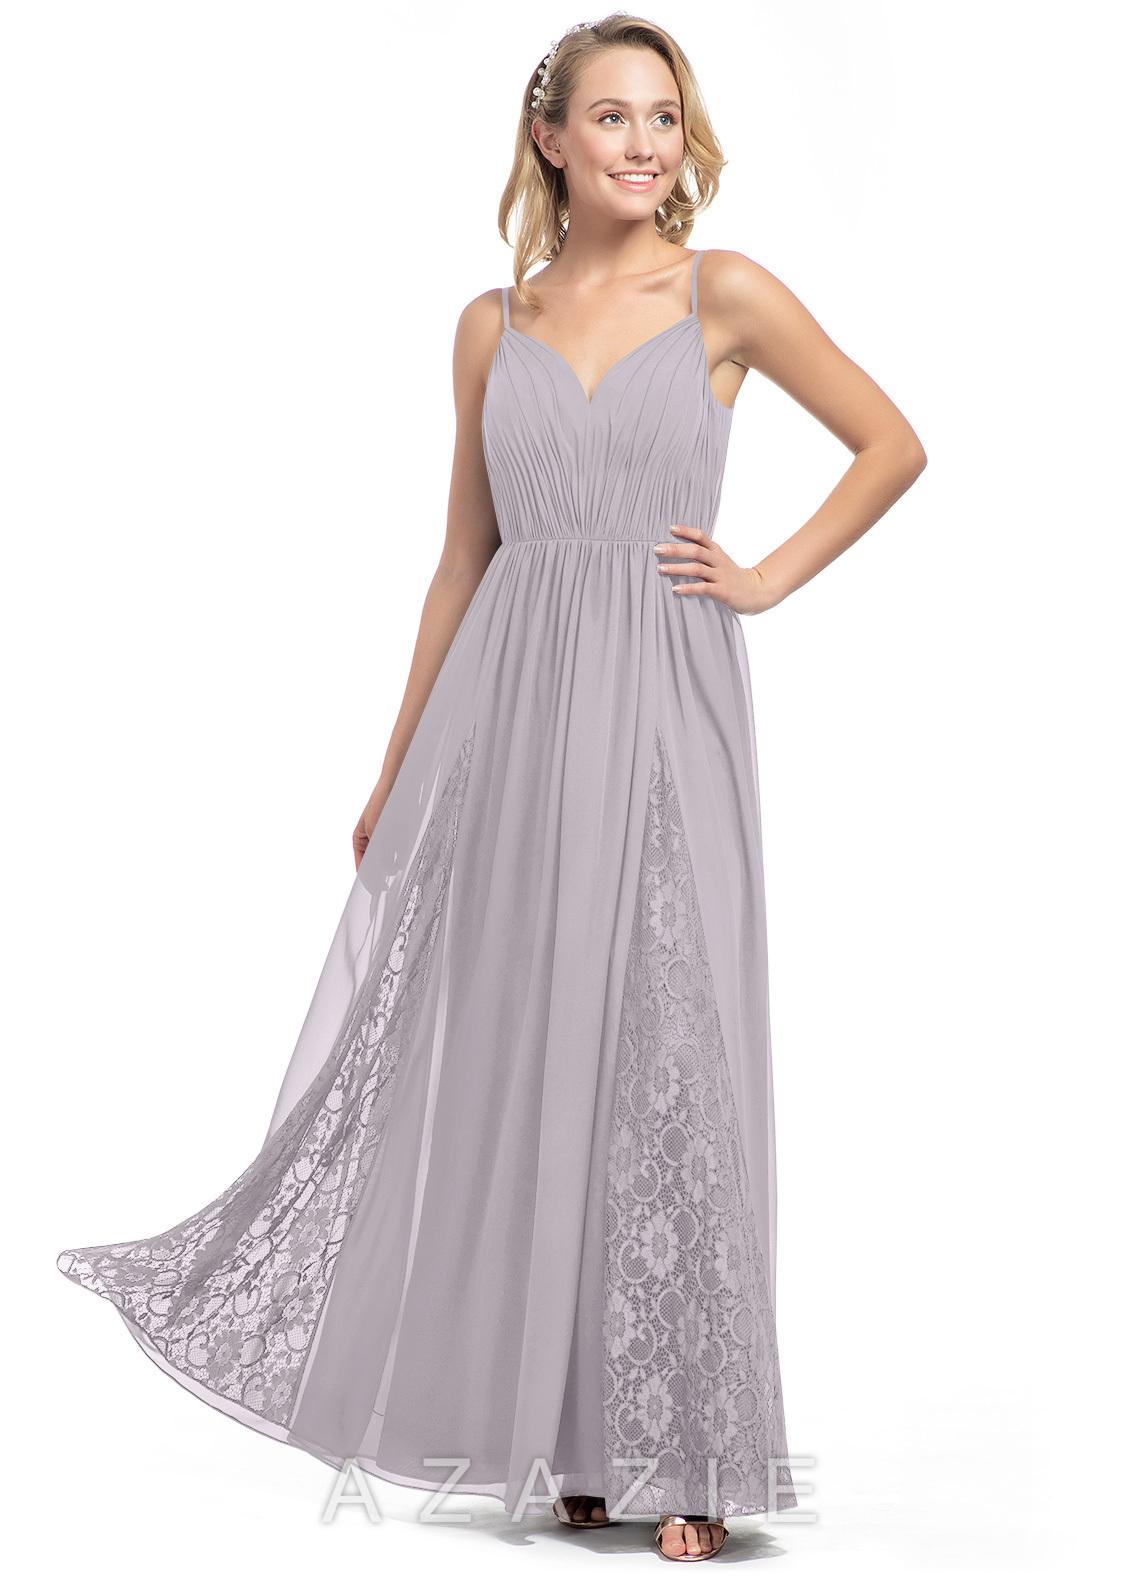 603803b1ffd3c Azazie Daisy Bridesmaid Dress | Azazie